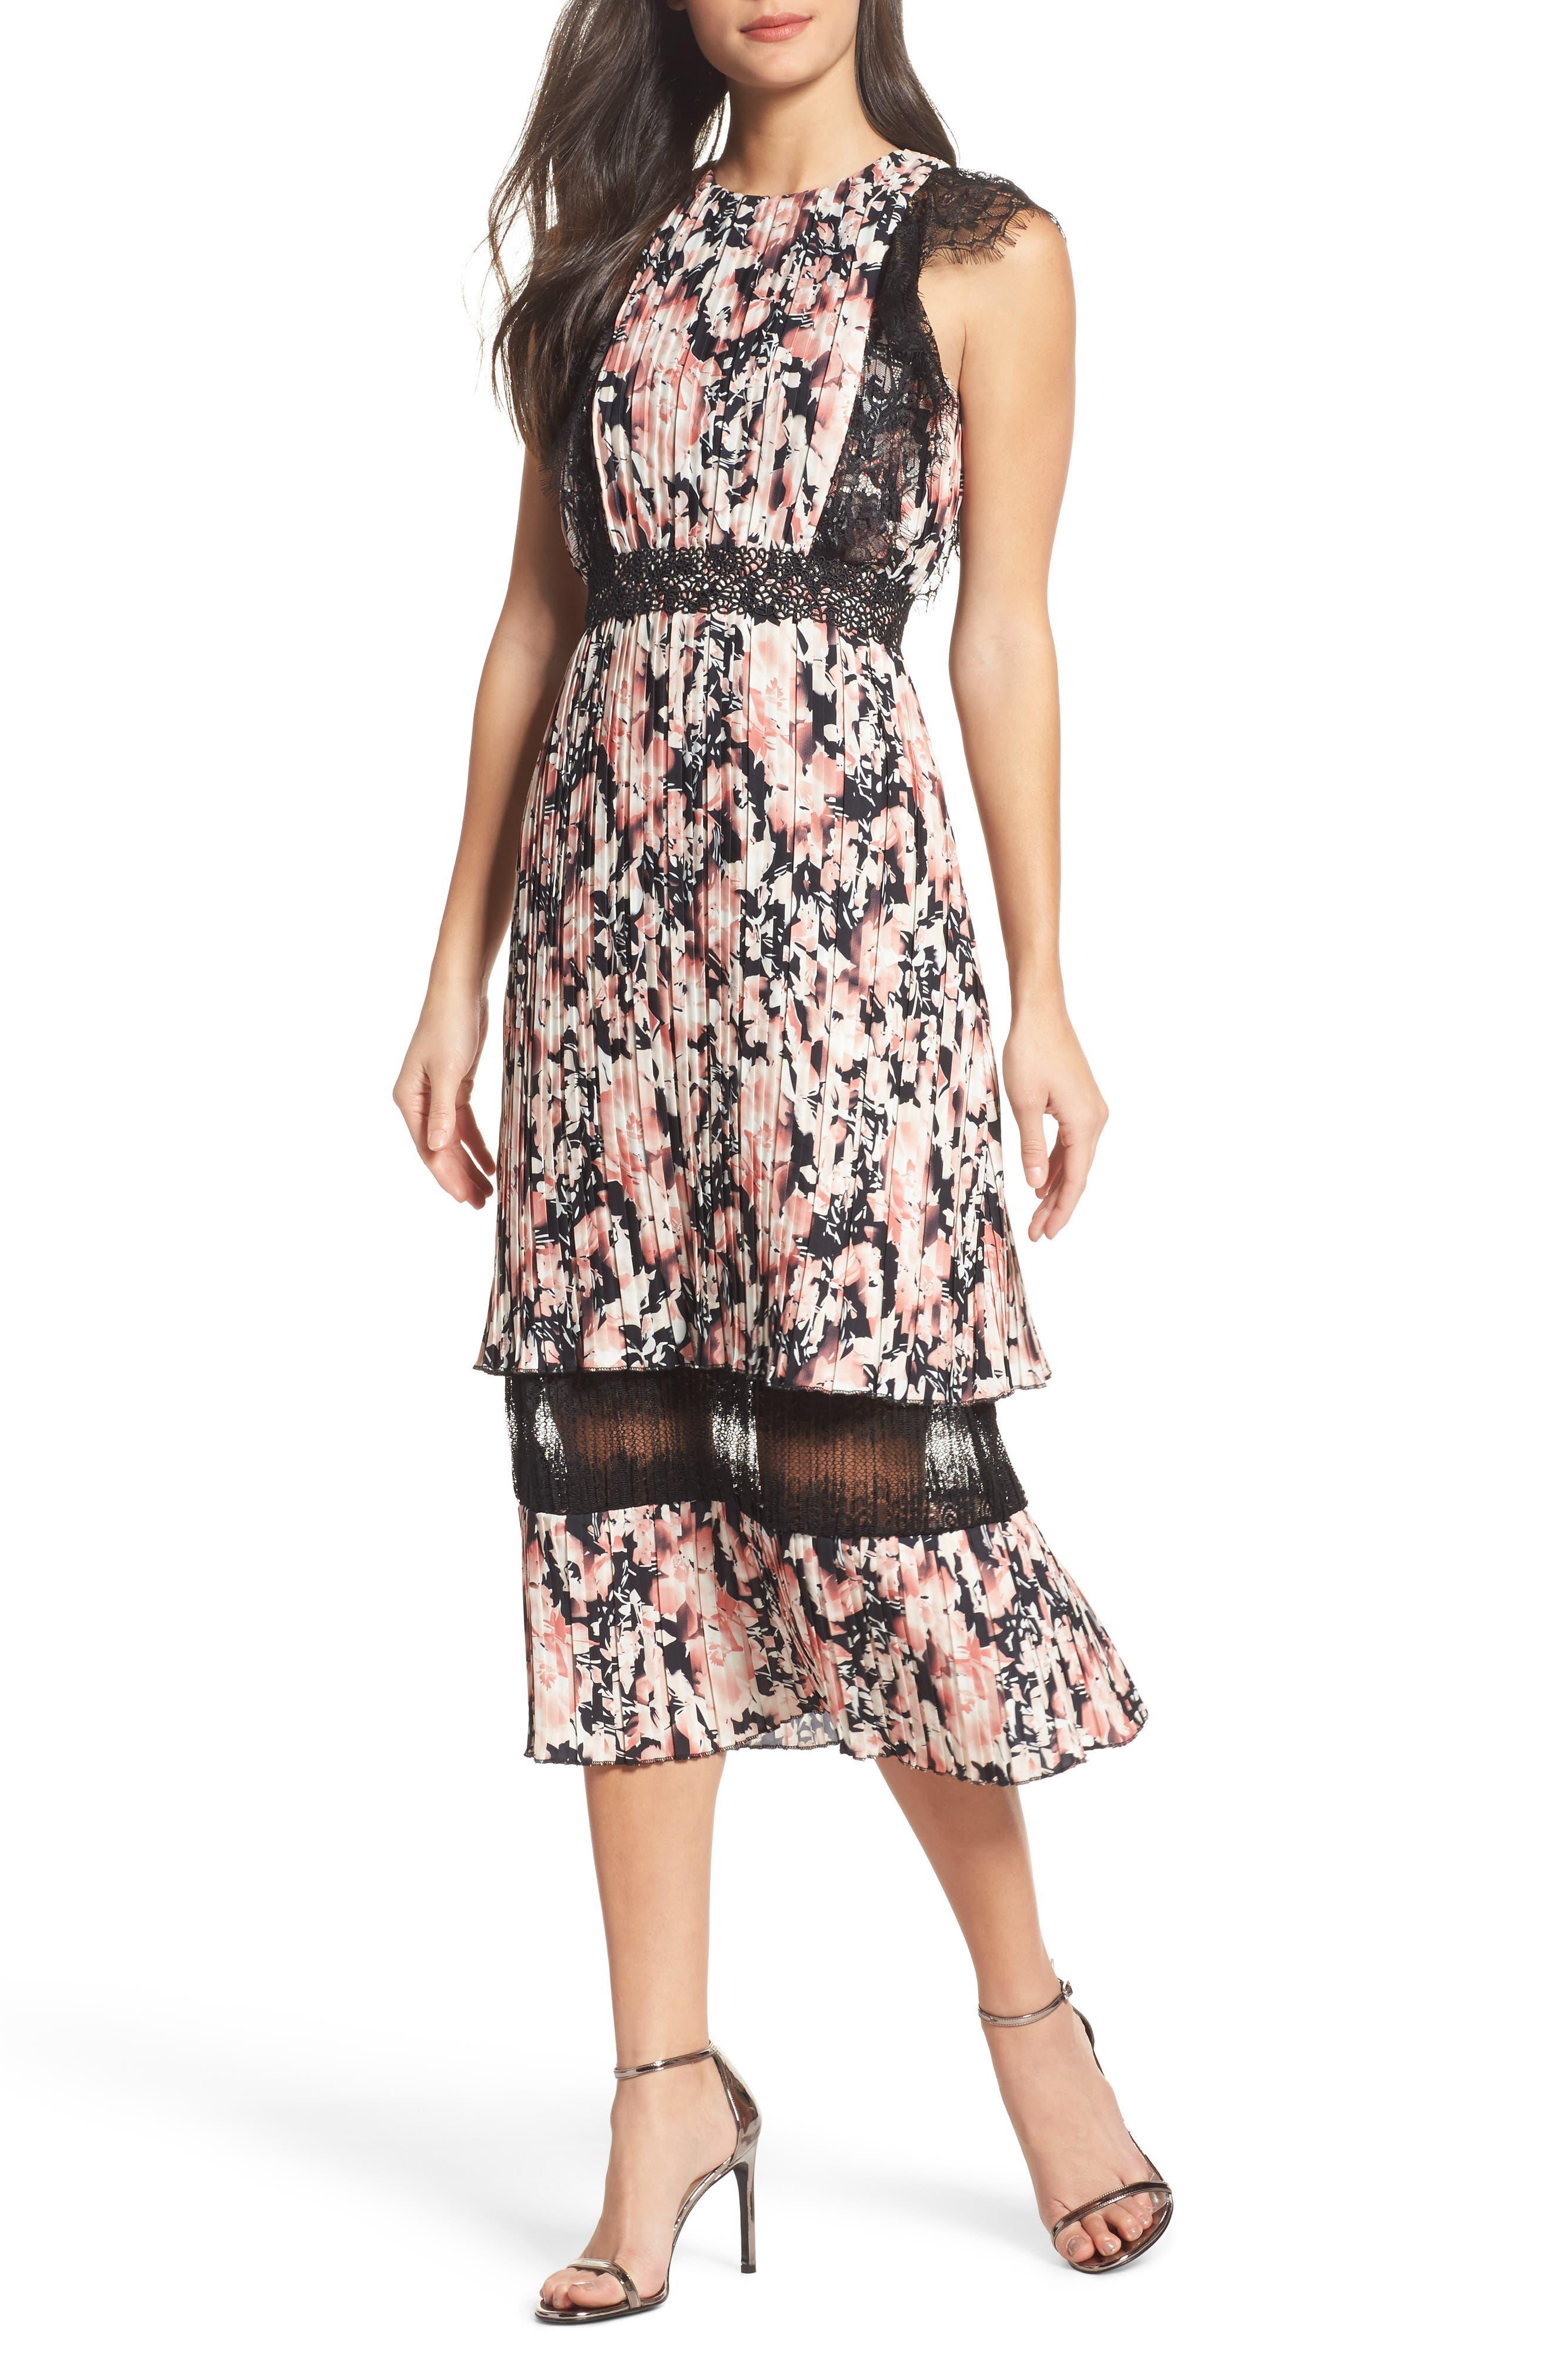 Main Image - Foxiedox Jasmine Lace Trim Pleated Floral Midi Dress